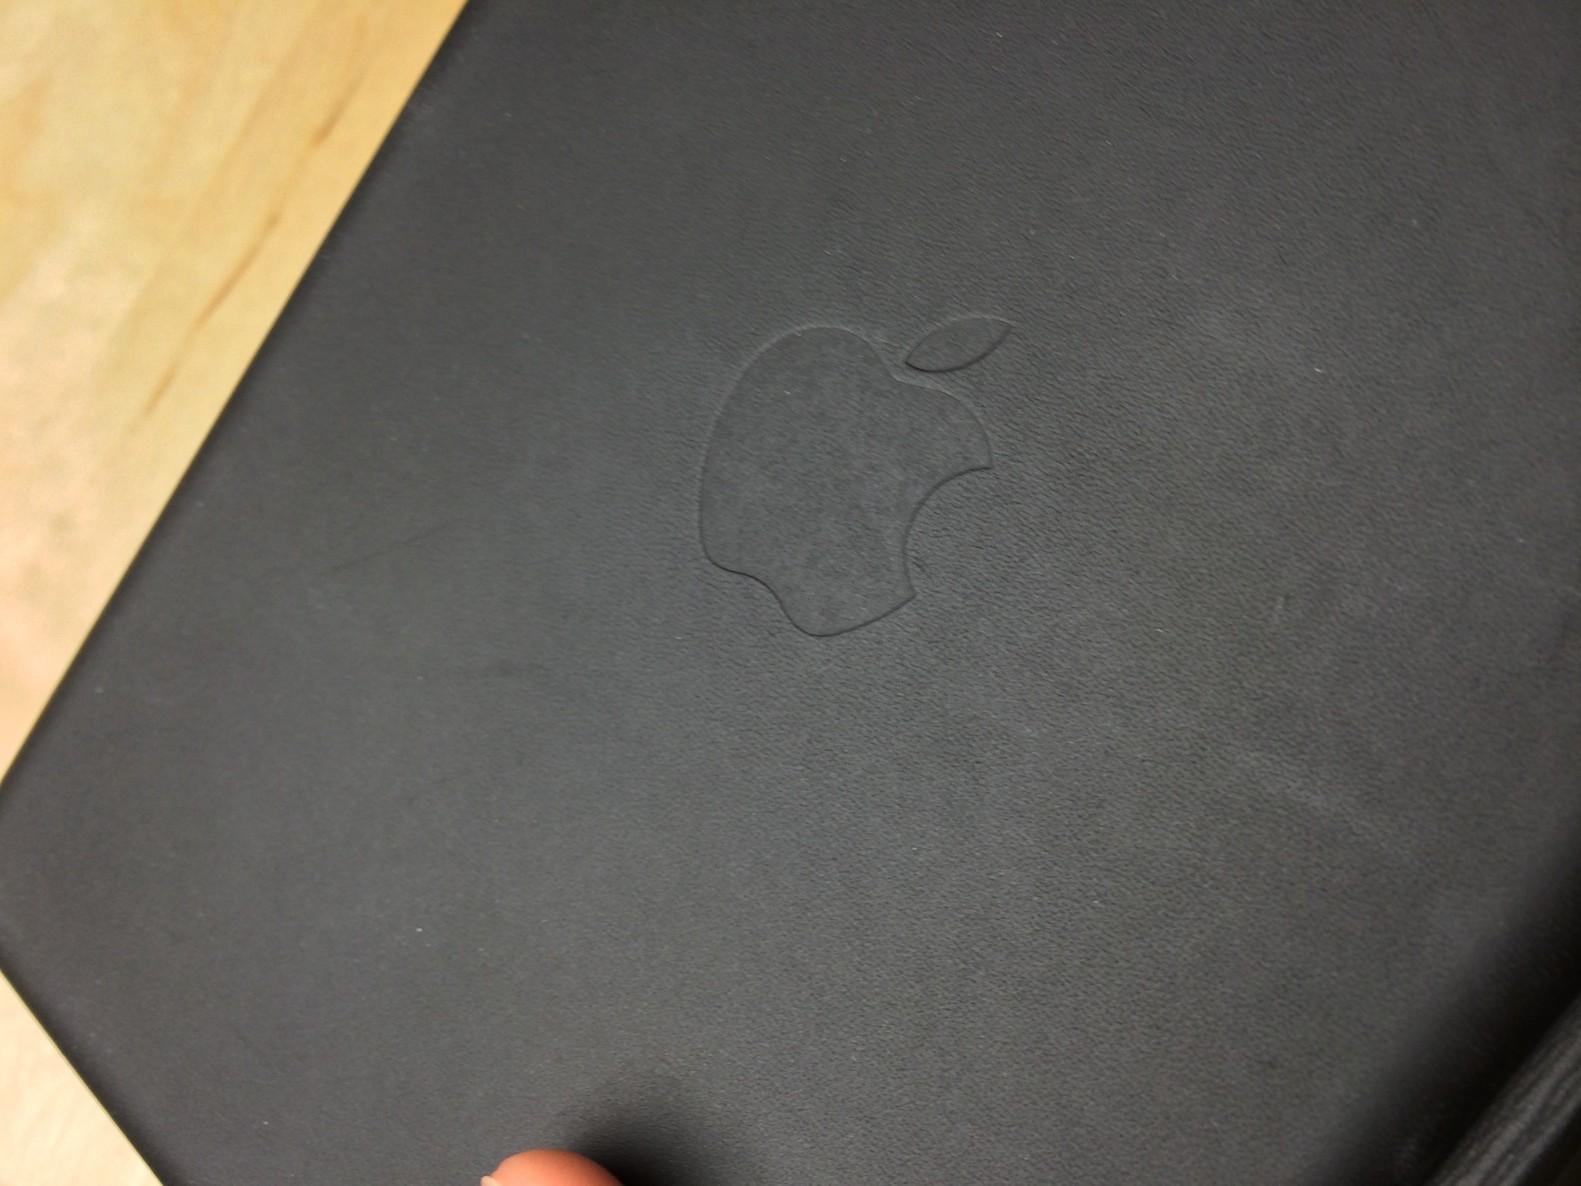 iPad mini Retina Display Review 13